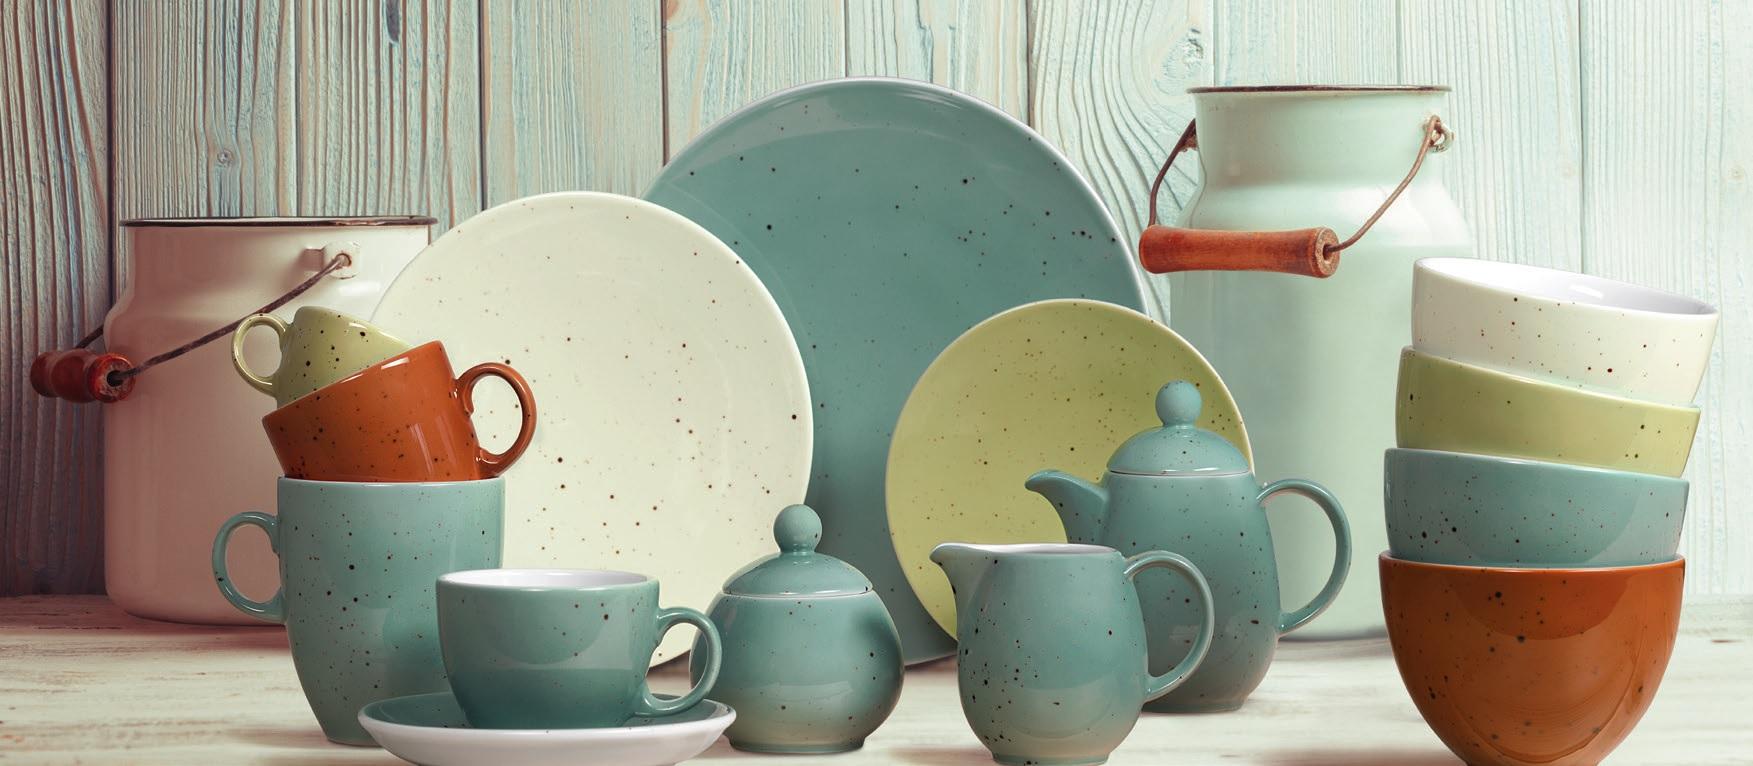 Каменная посуда с глазурью